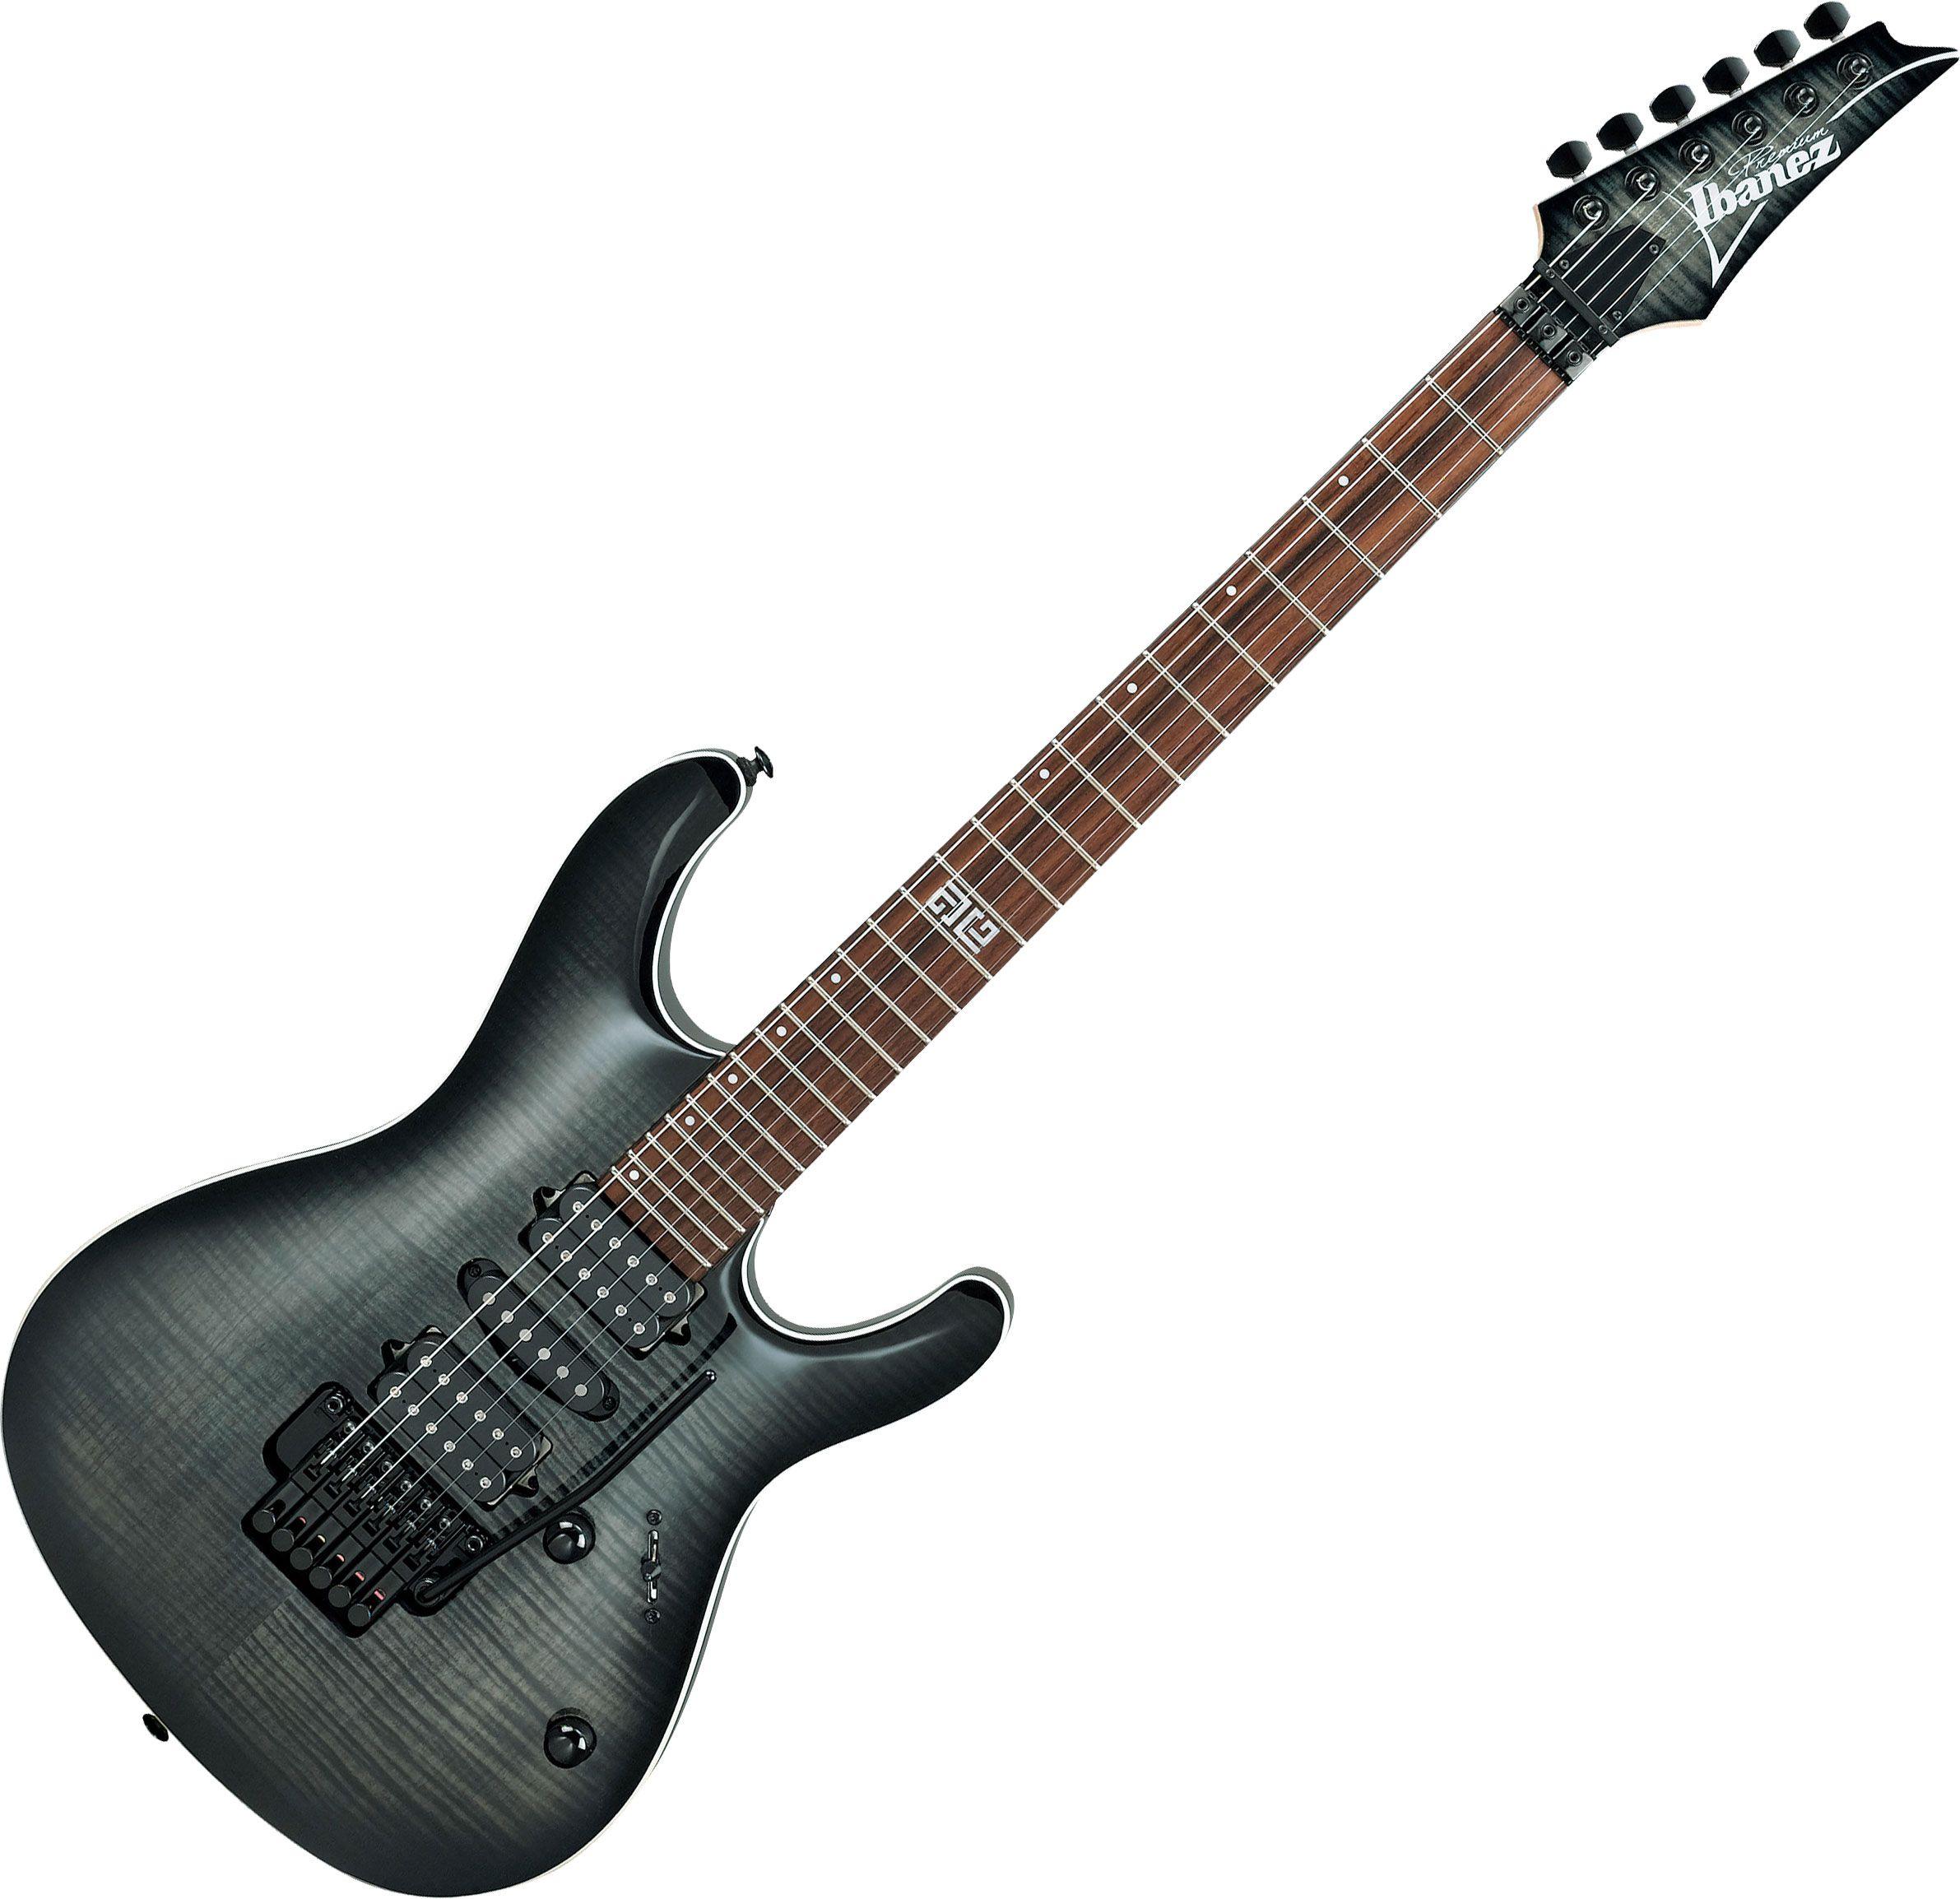 ibanez kiko loureiro signature kiko10bp electric guitar transparent gray burst. Black Bedroom Furniture Sets. Home Design Ideas